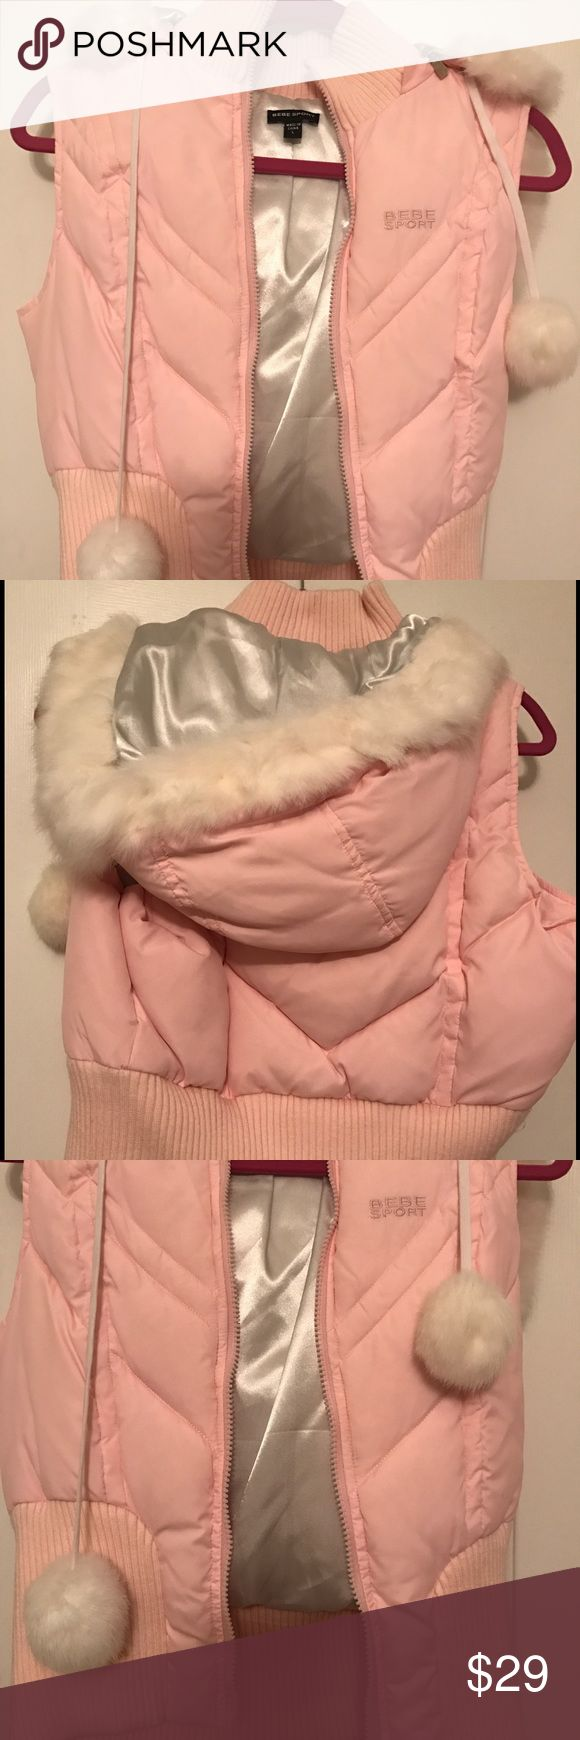 BNWOT: Bebe soft pink vest zipper fur hood sz: L BNWOT: Bebe Sport soft pink vest zipper fur hood sz: L never worn, insulated and super comfy. The hood can detach to make a sporty vest. Make an offer ❤ bebe Jackets & Coats Vests